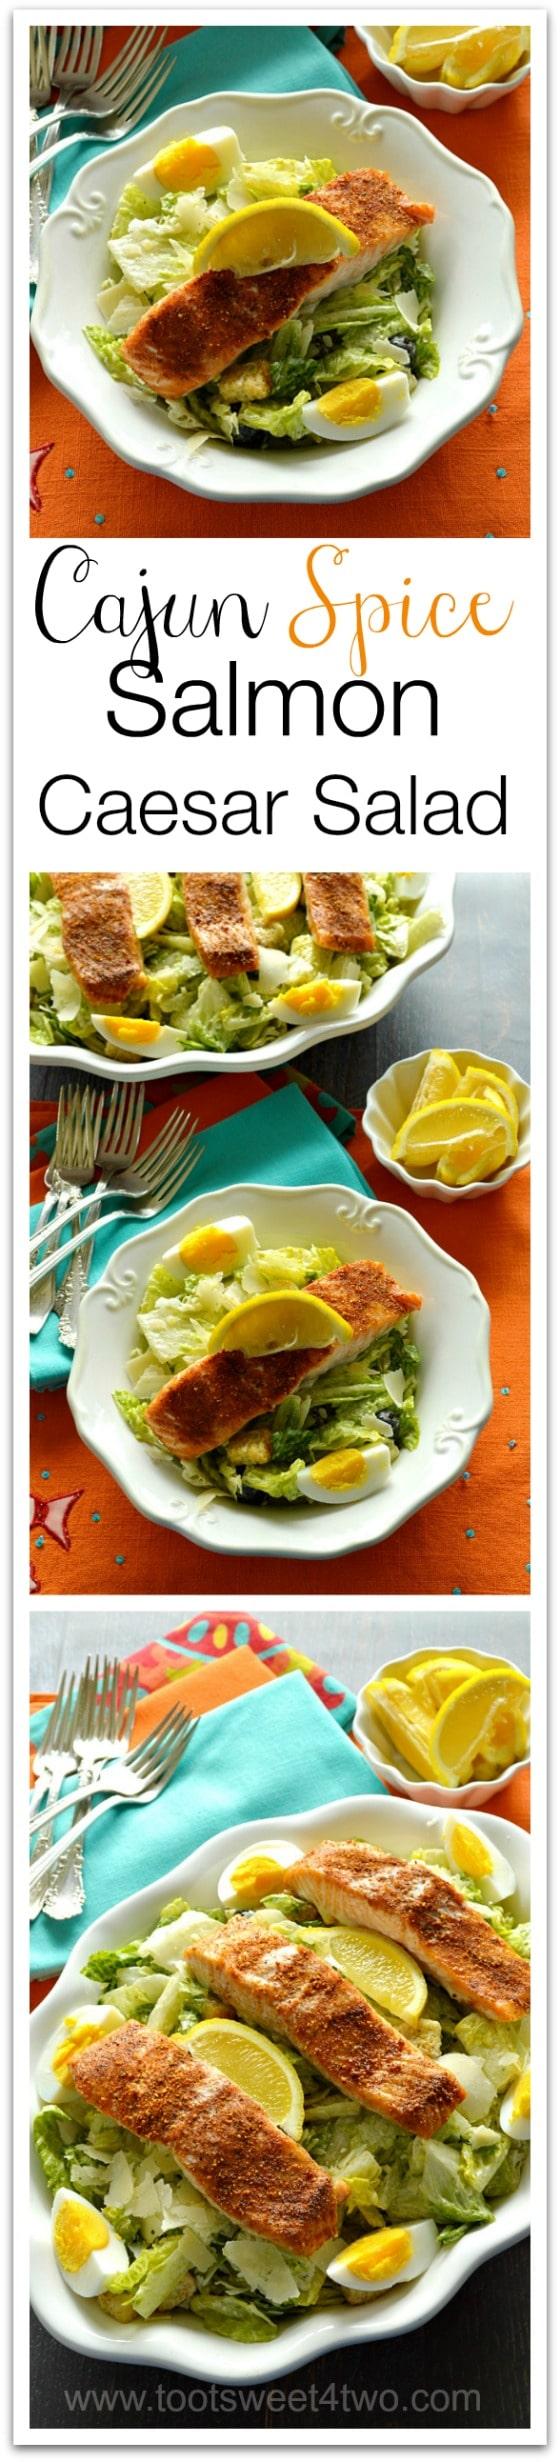 Cajun Spice Salmon Caesar Salad Collage